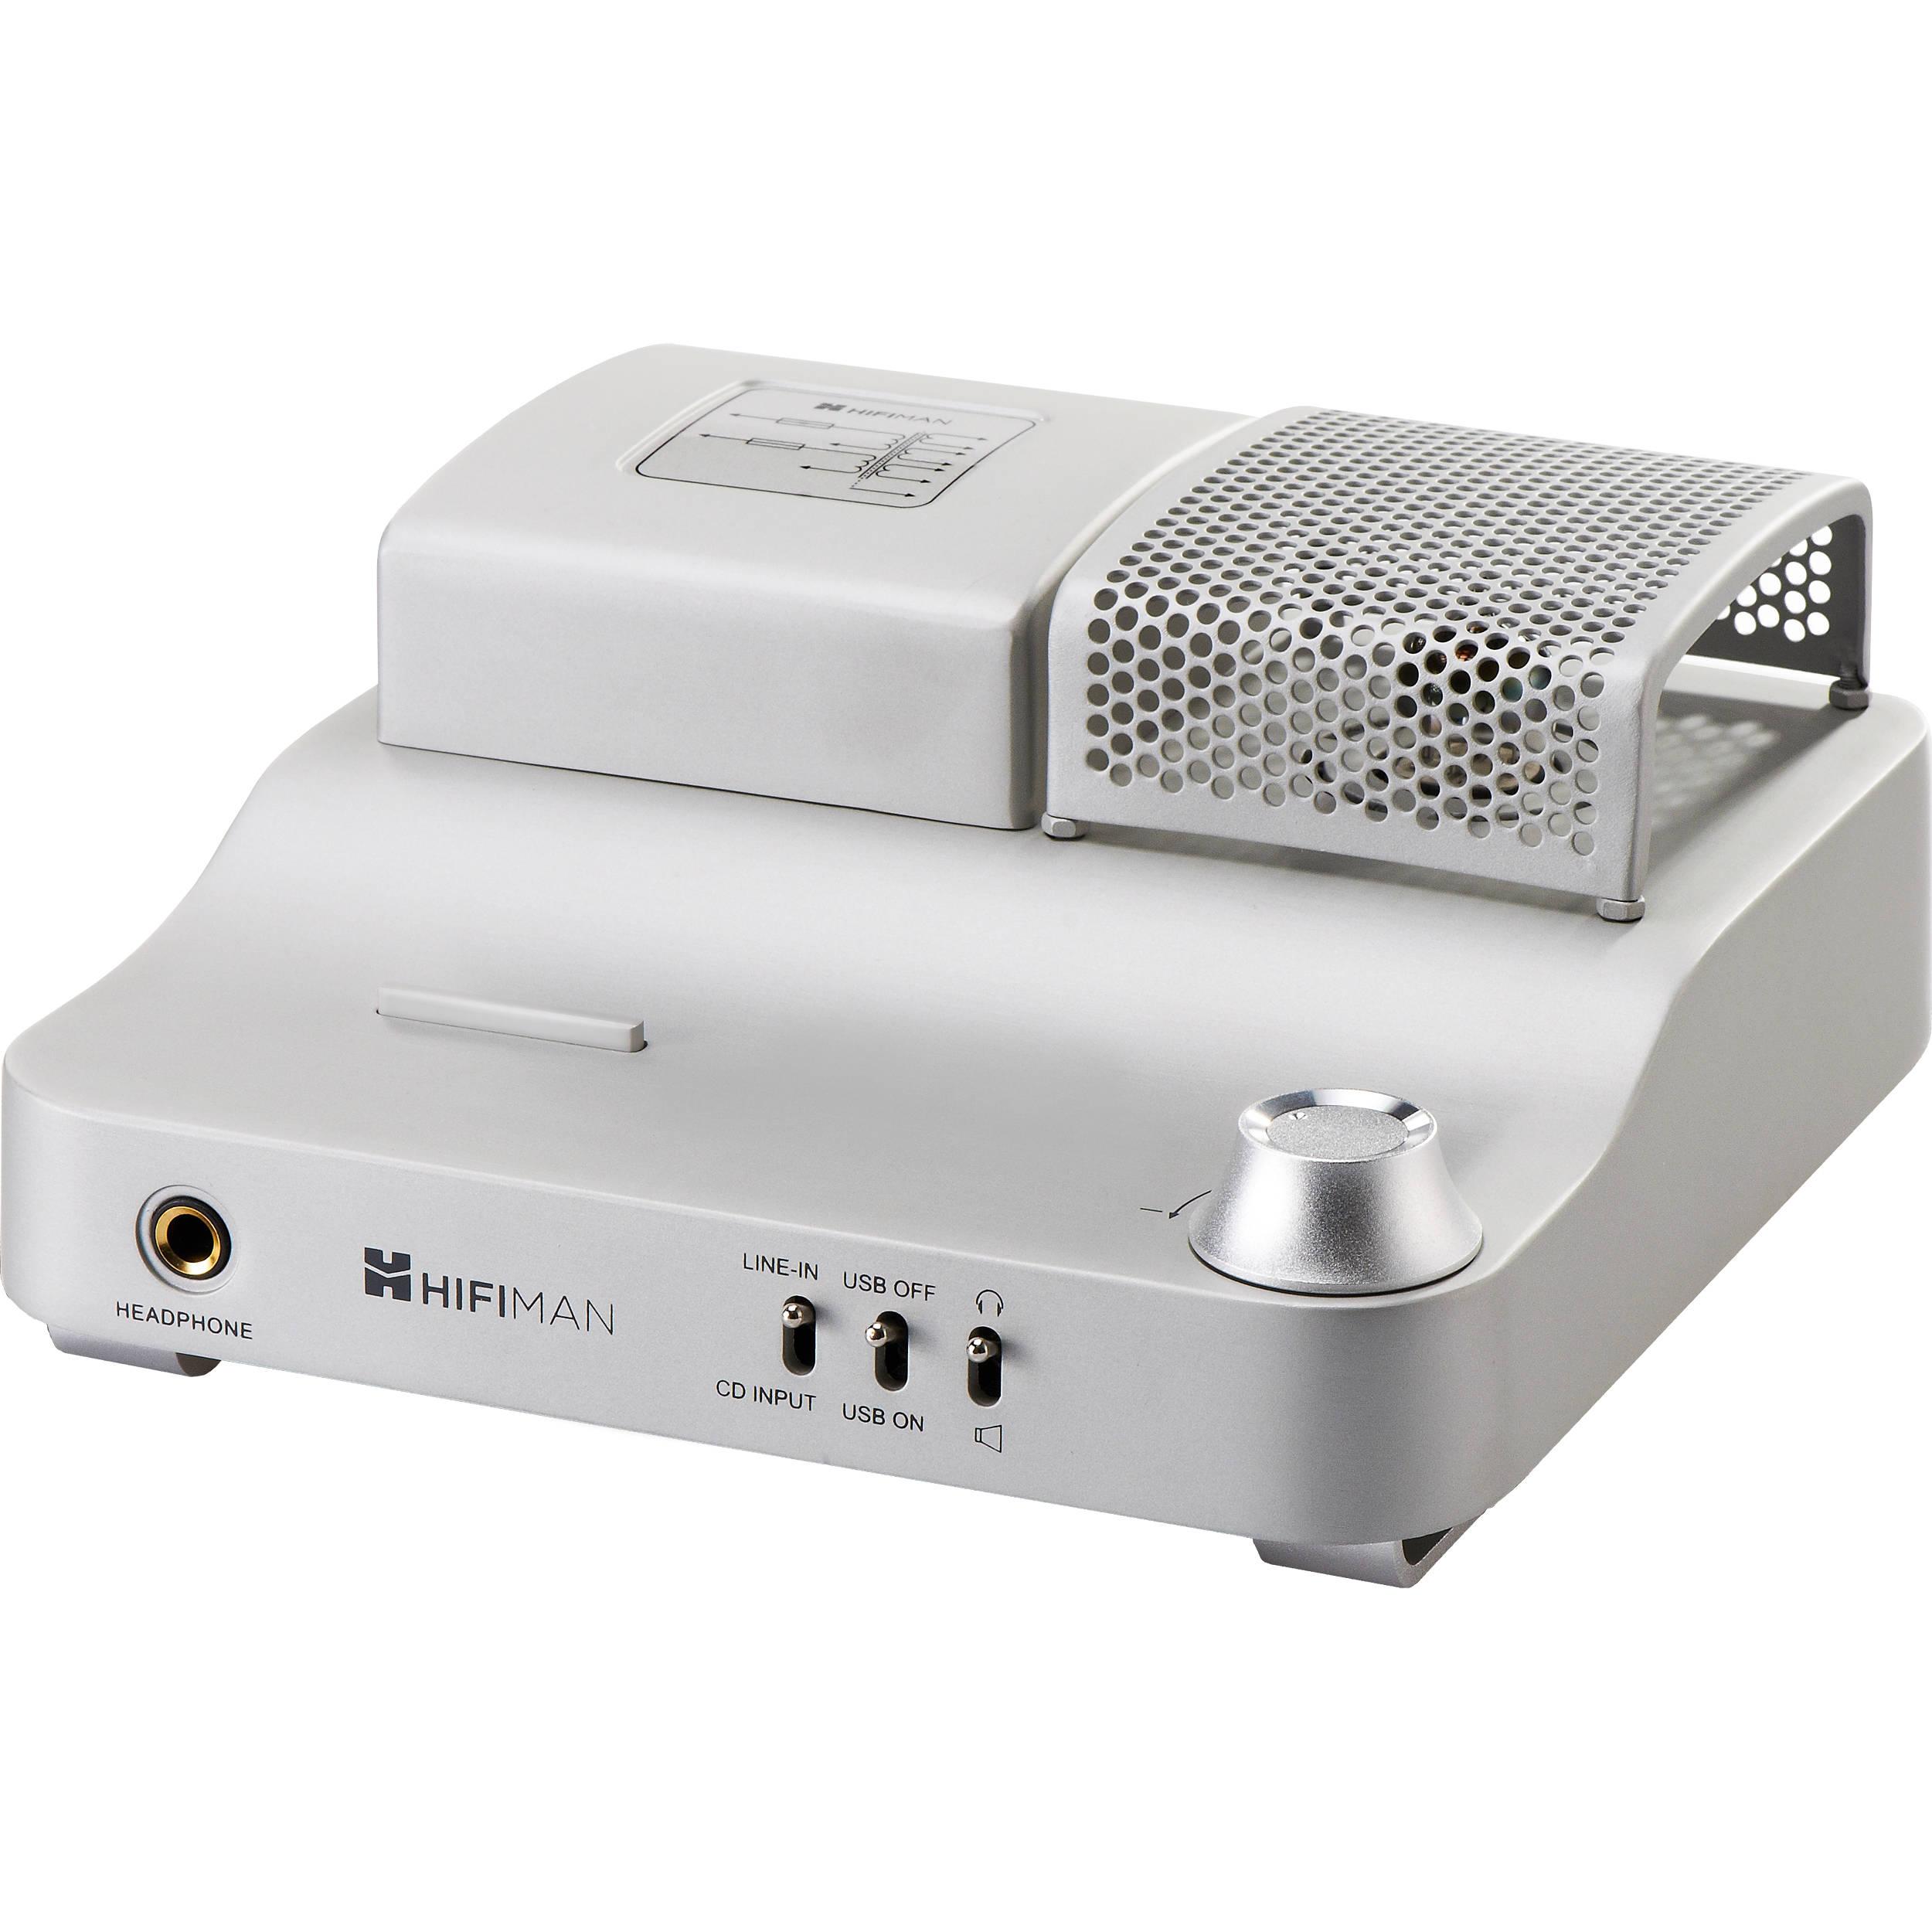 Hifiman Ef100 Hybrid Headphone Amplifier Bh Photo Video Hi Fi